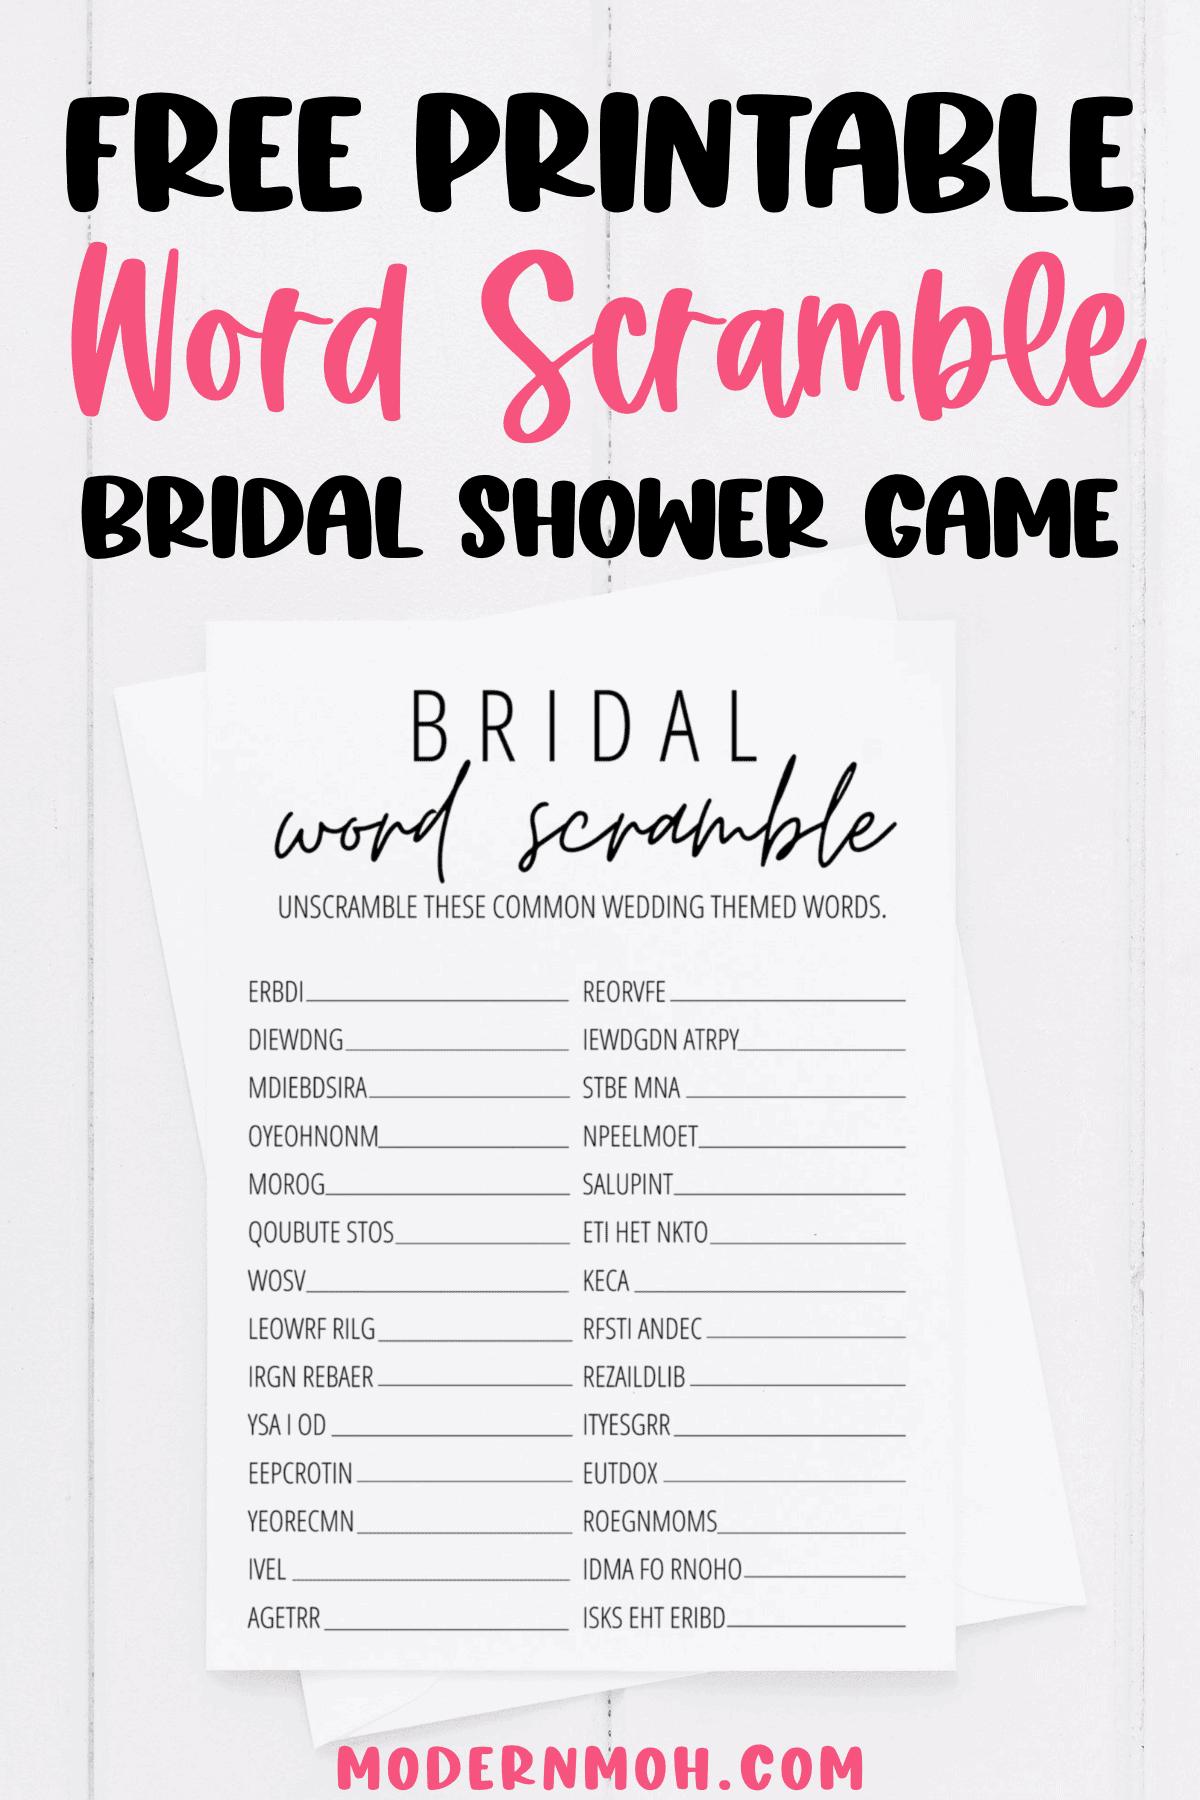 Bridal Shower Word Scramble Free Printable